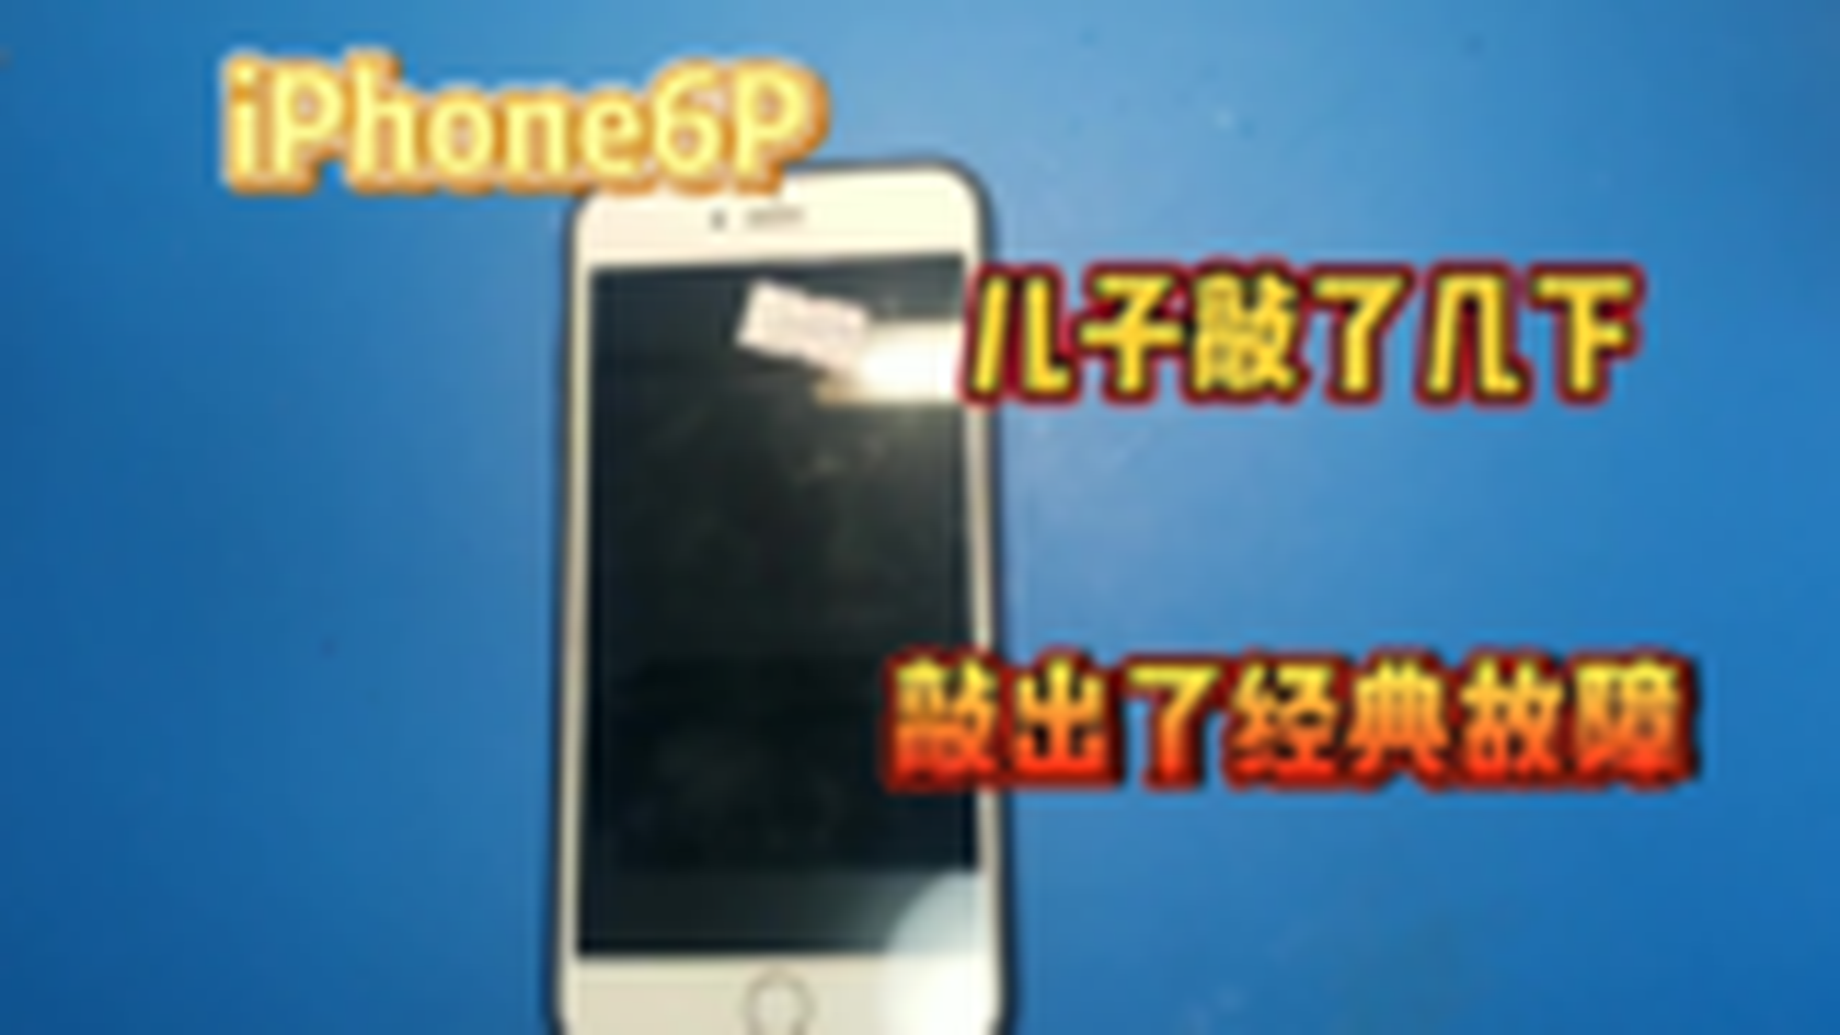 iPhone6P小孩敲了几下,敲出了经典故障,屏幕闪白条后触摸不灵,此故障现在越修越少了!